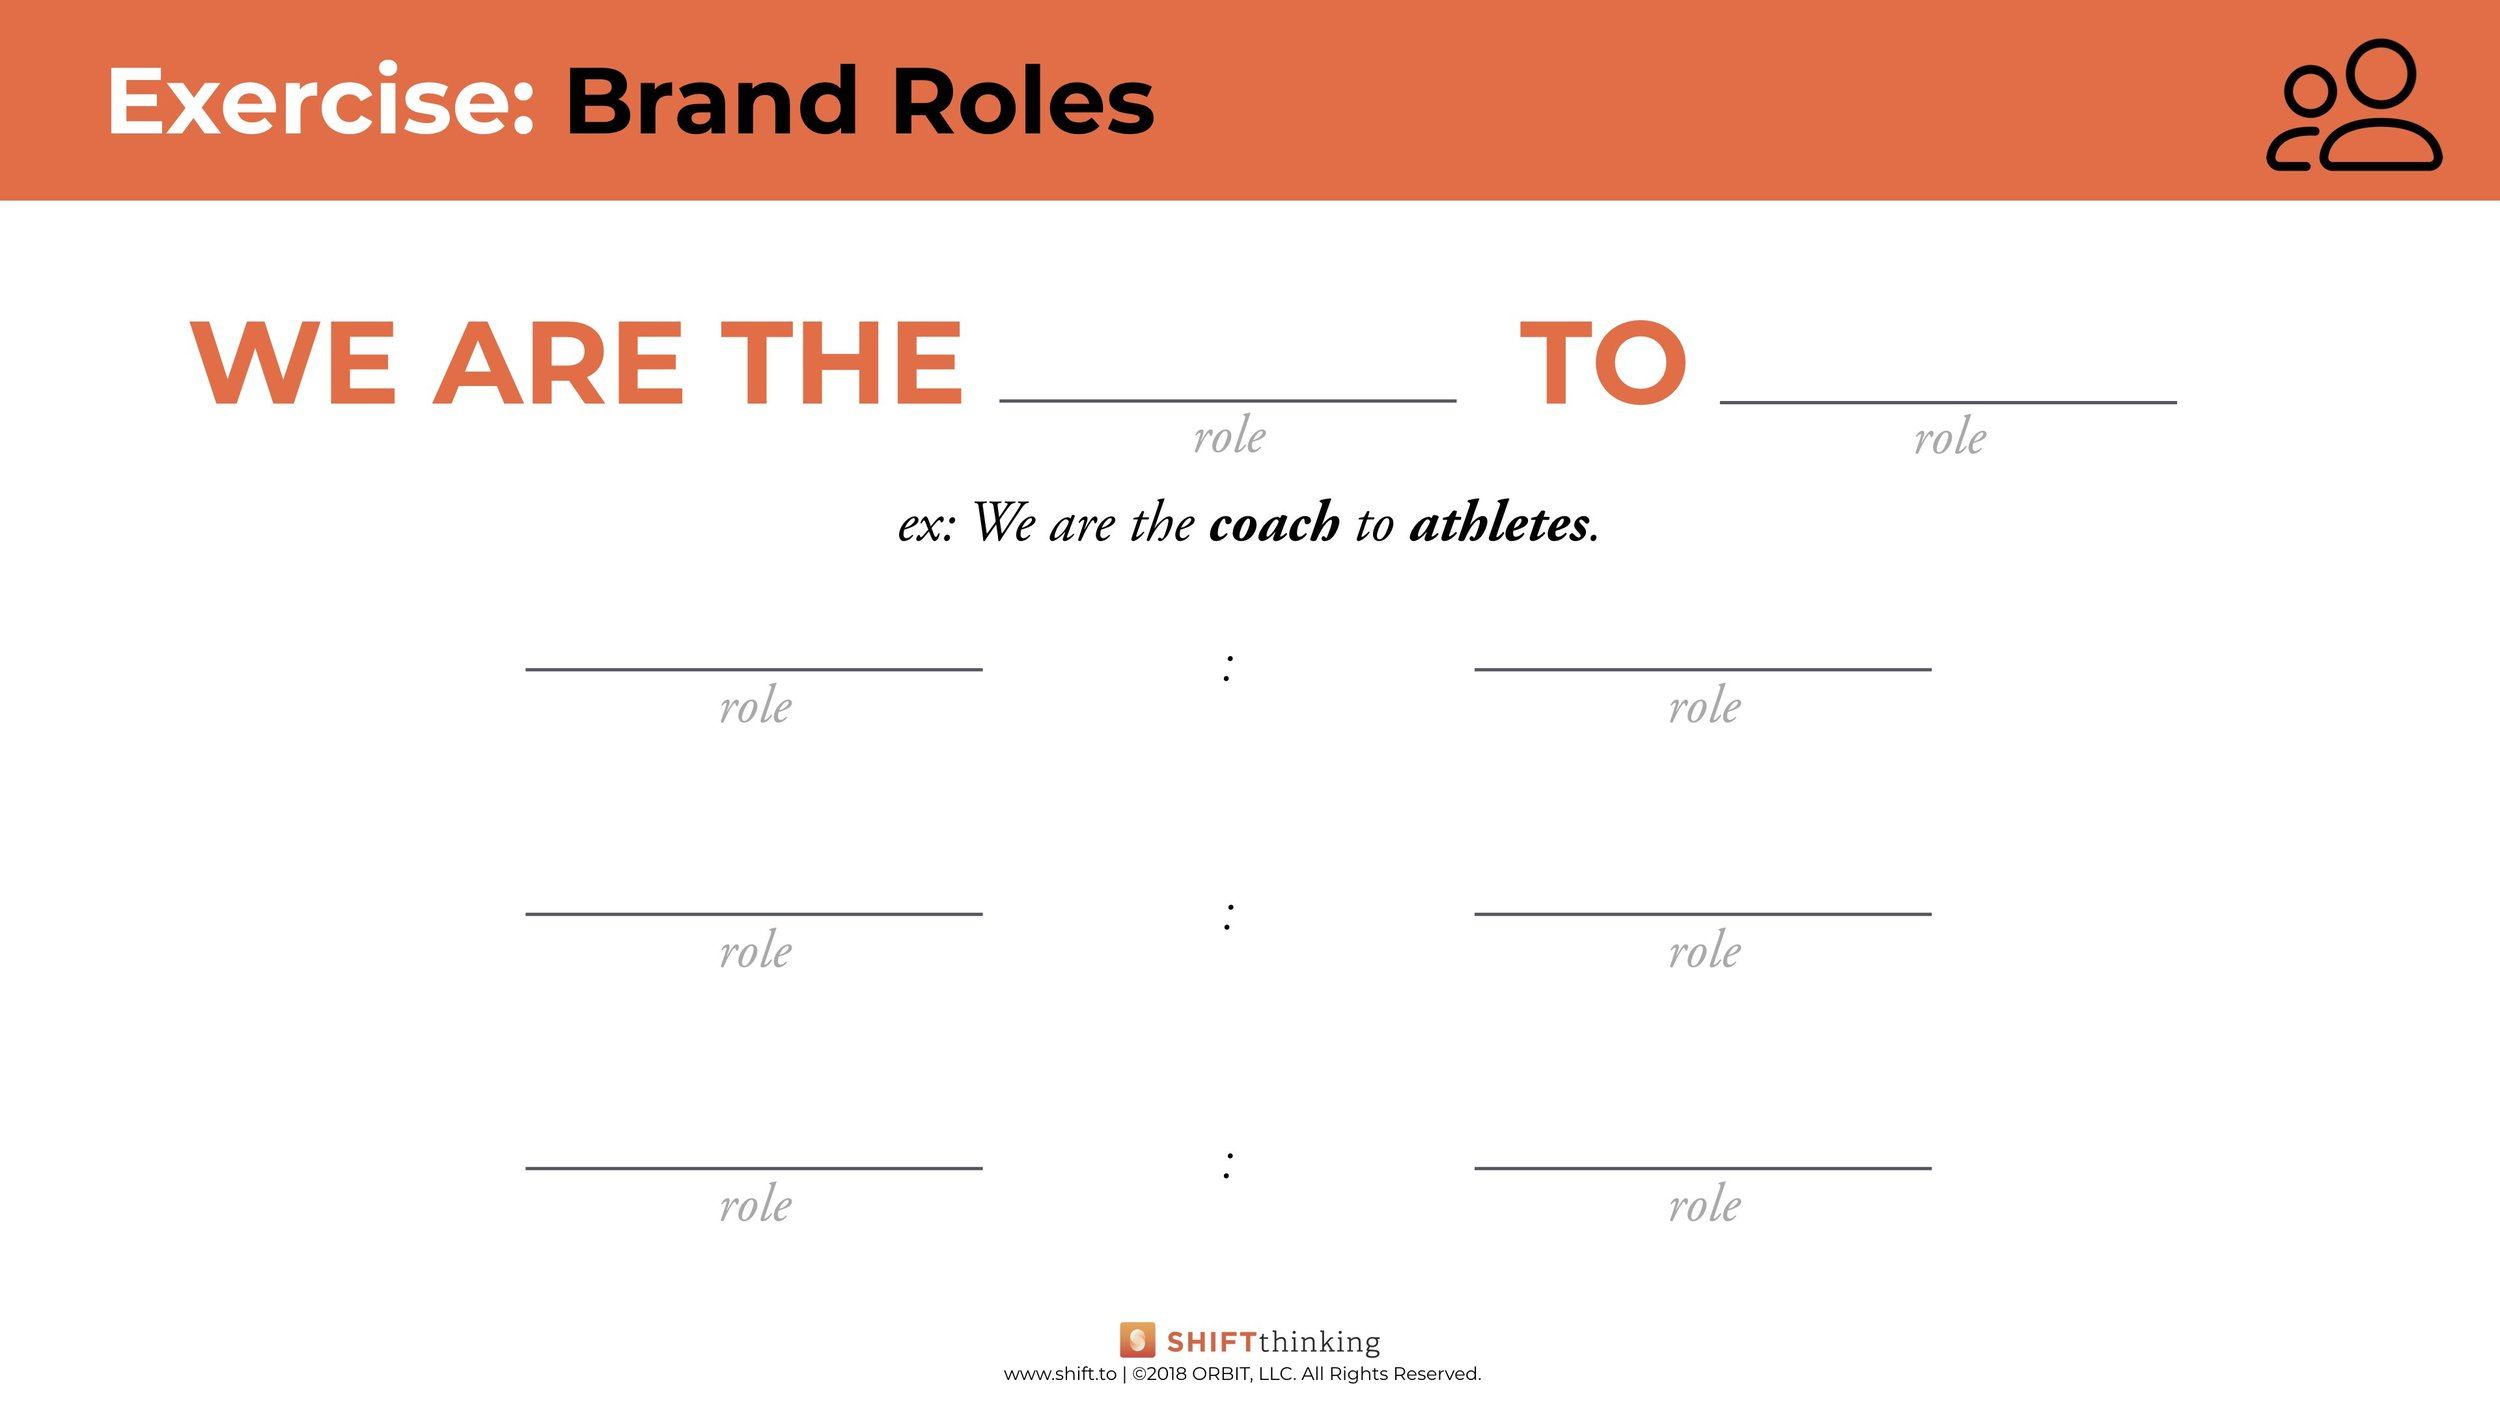 Brand Roles workbook sheet